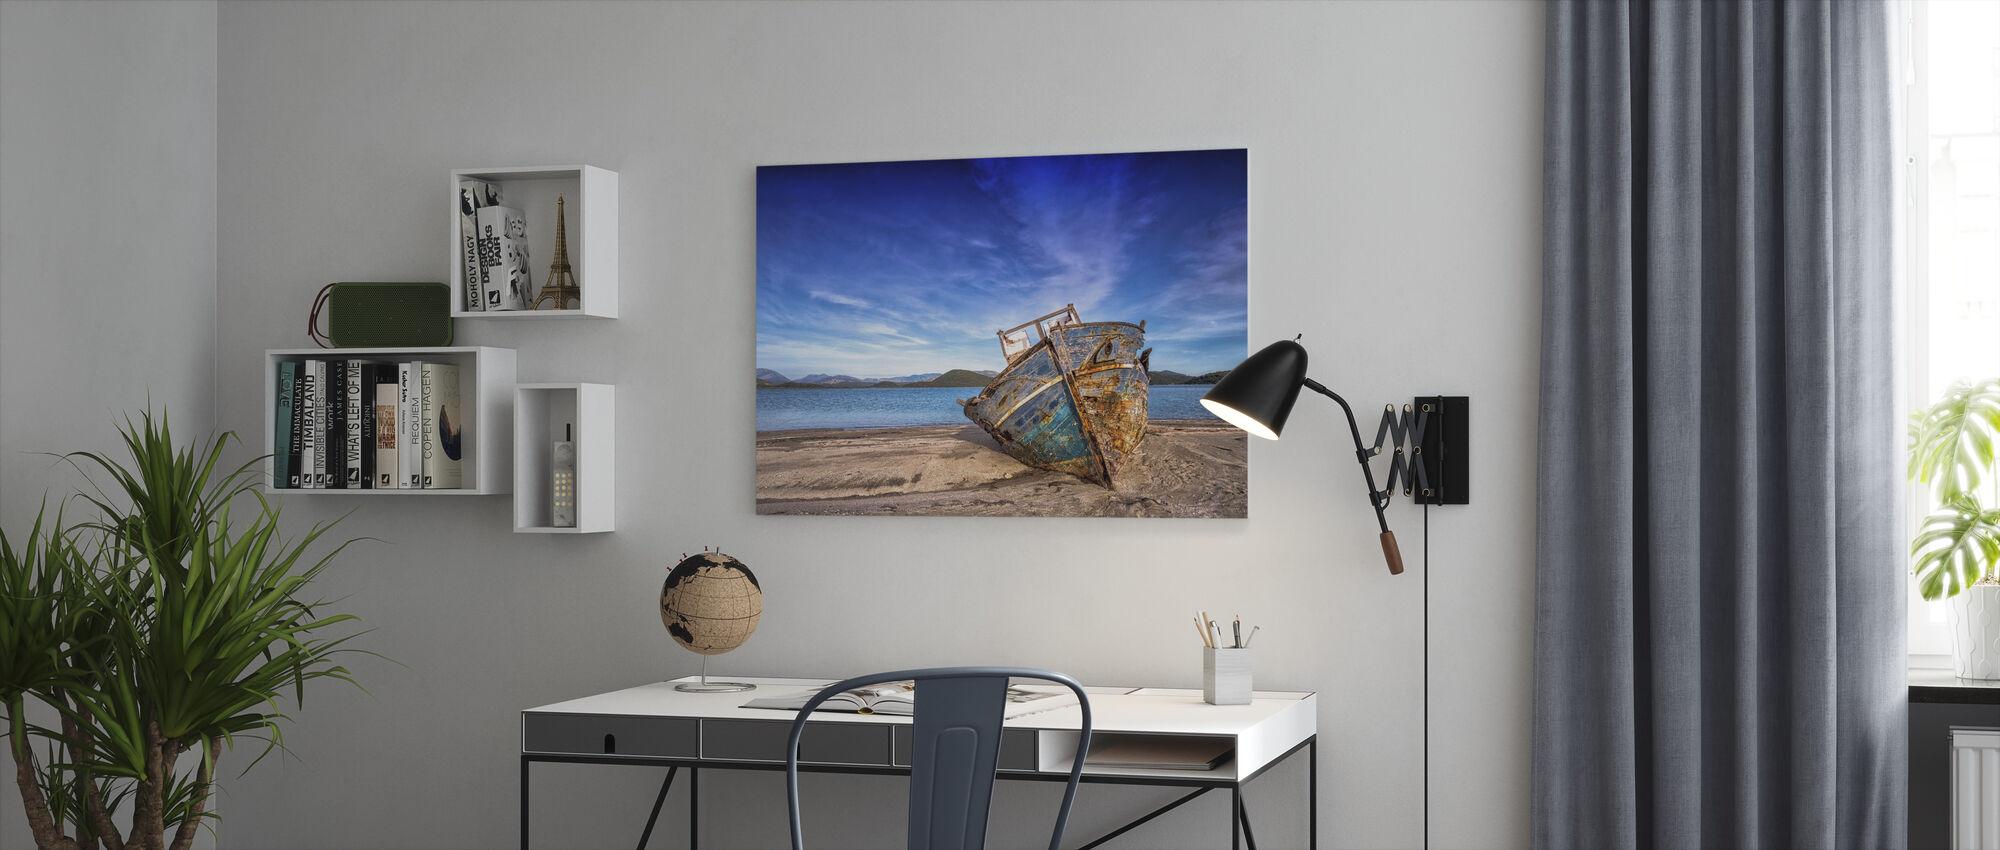 Altes Boot - Leinwandbild - Büro